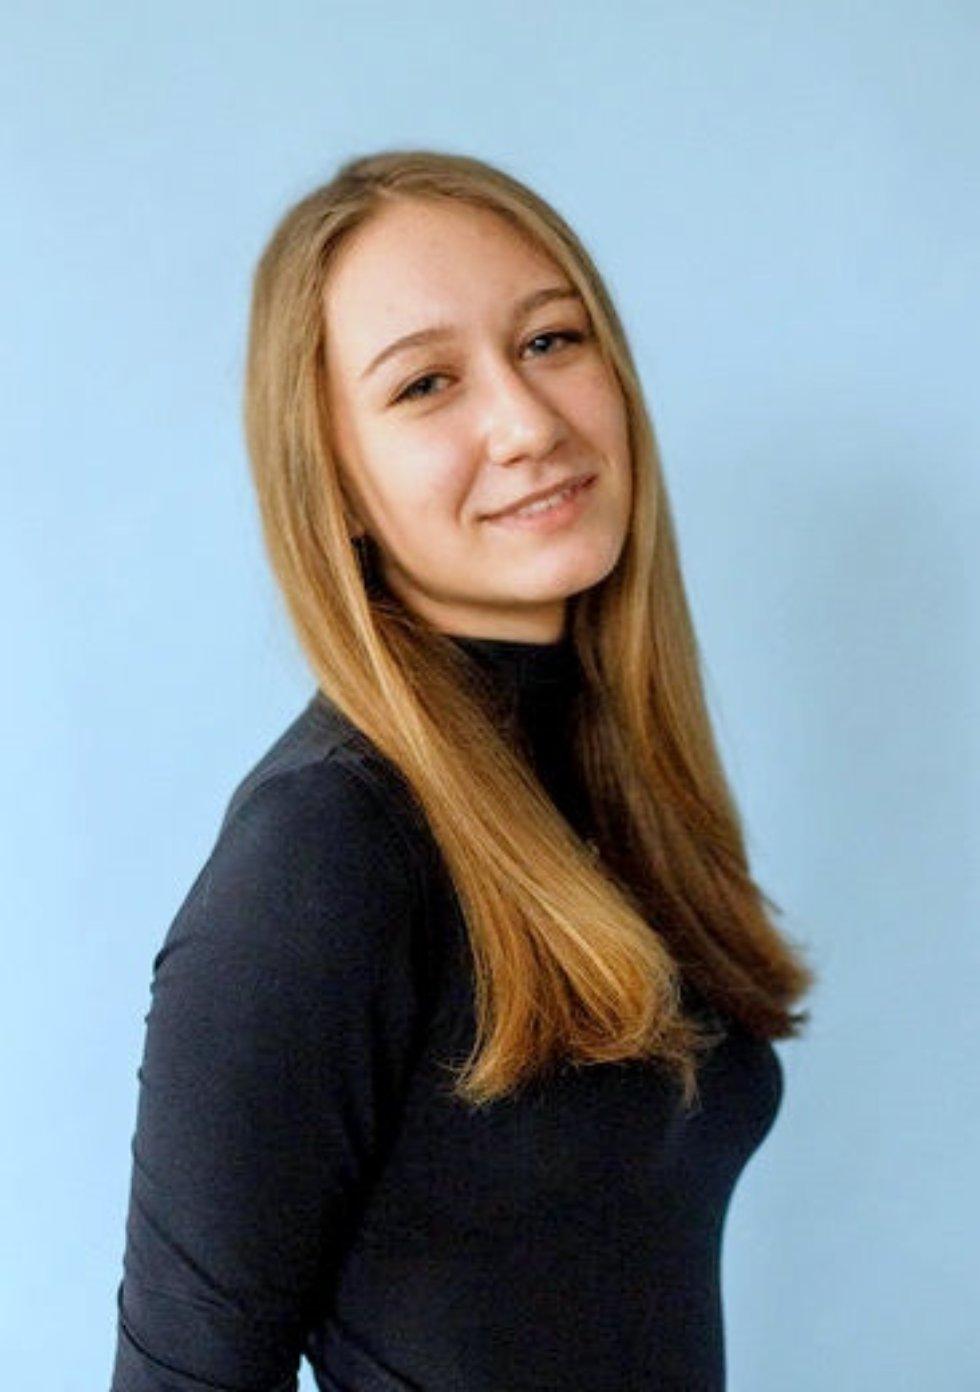 Арефьева Дарья Вадимовна